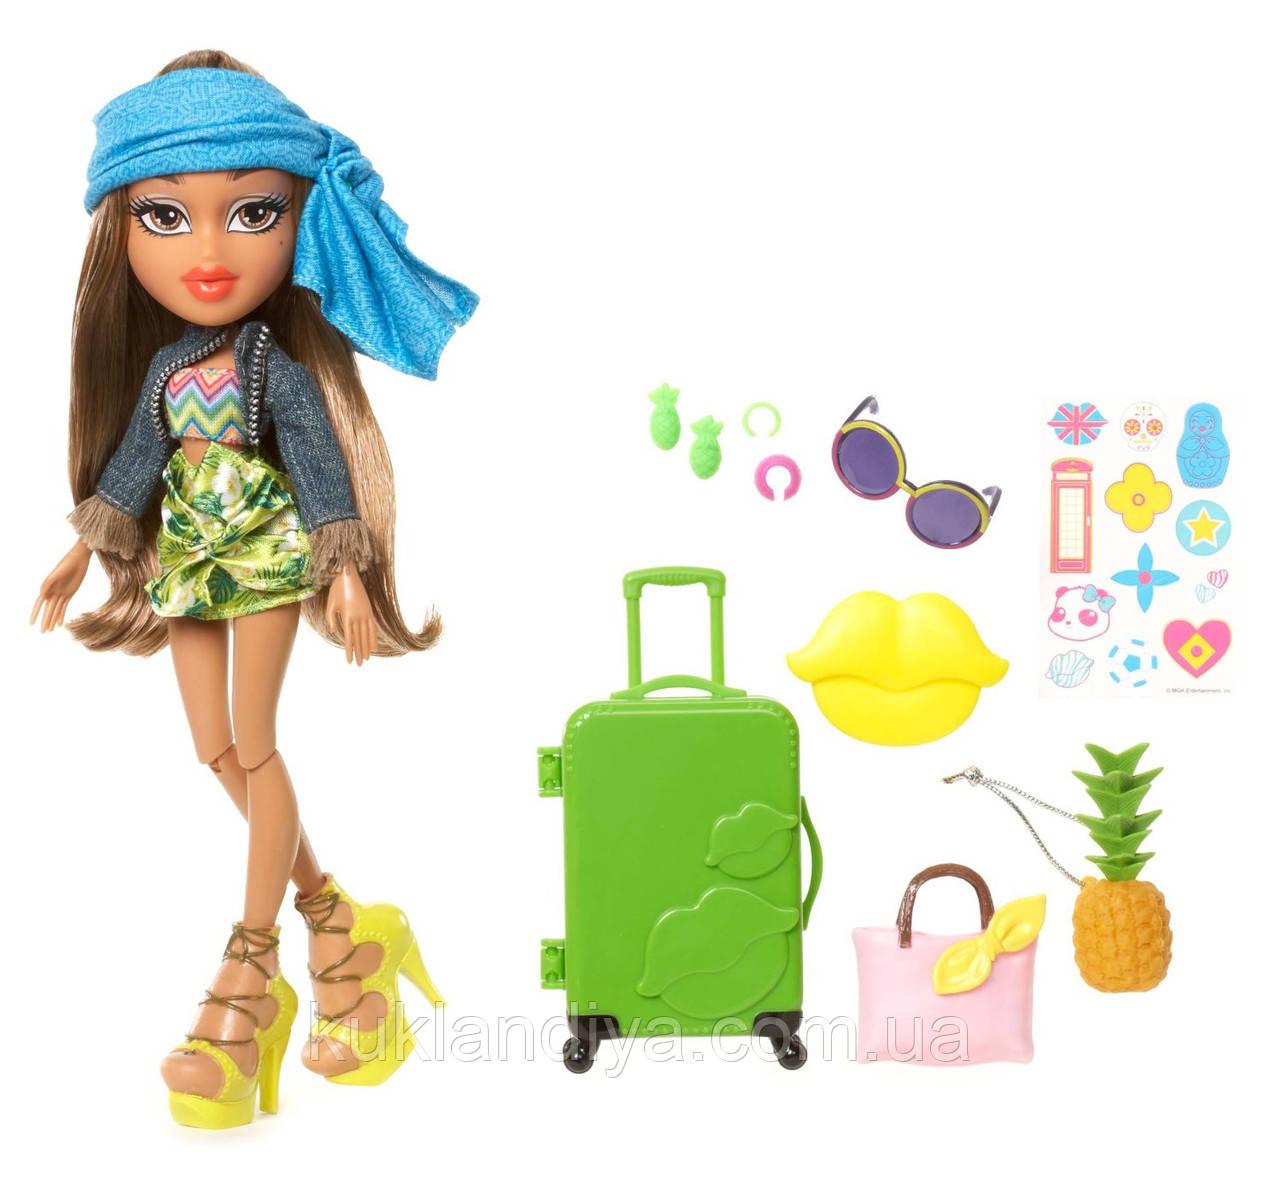 Кукла Bratz Ясмин в Бразилии